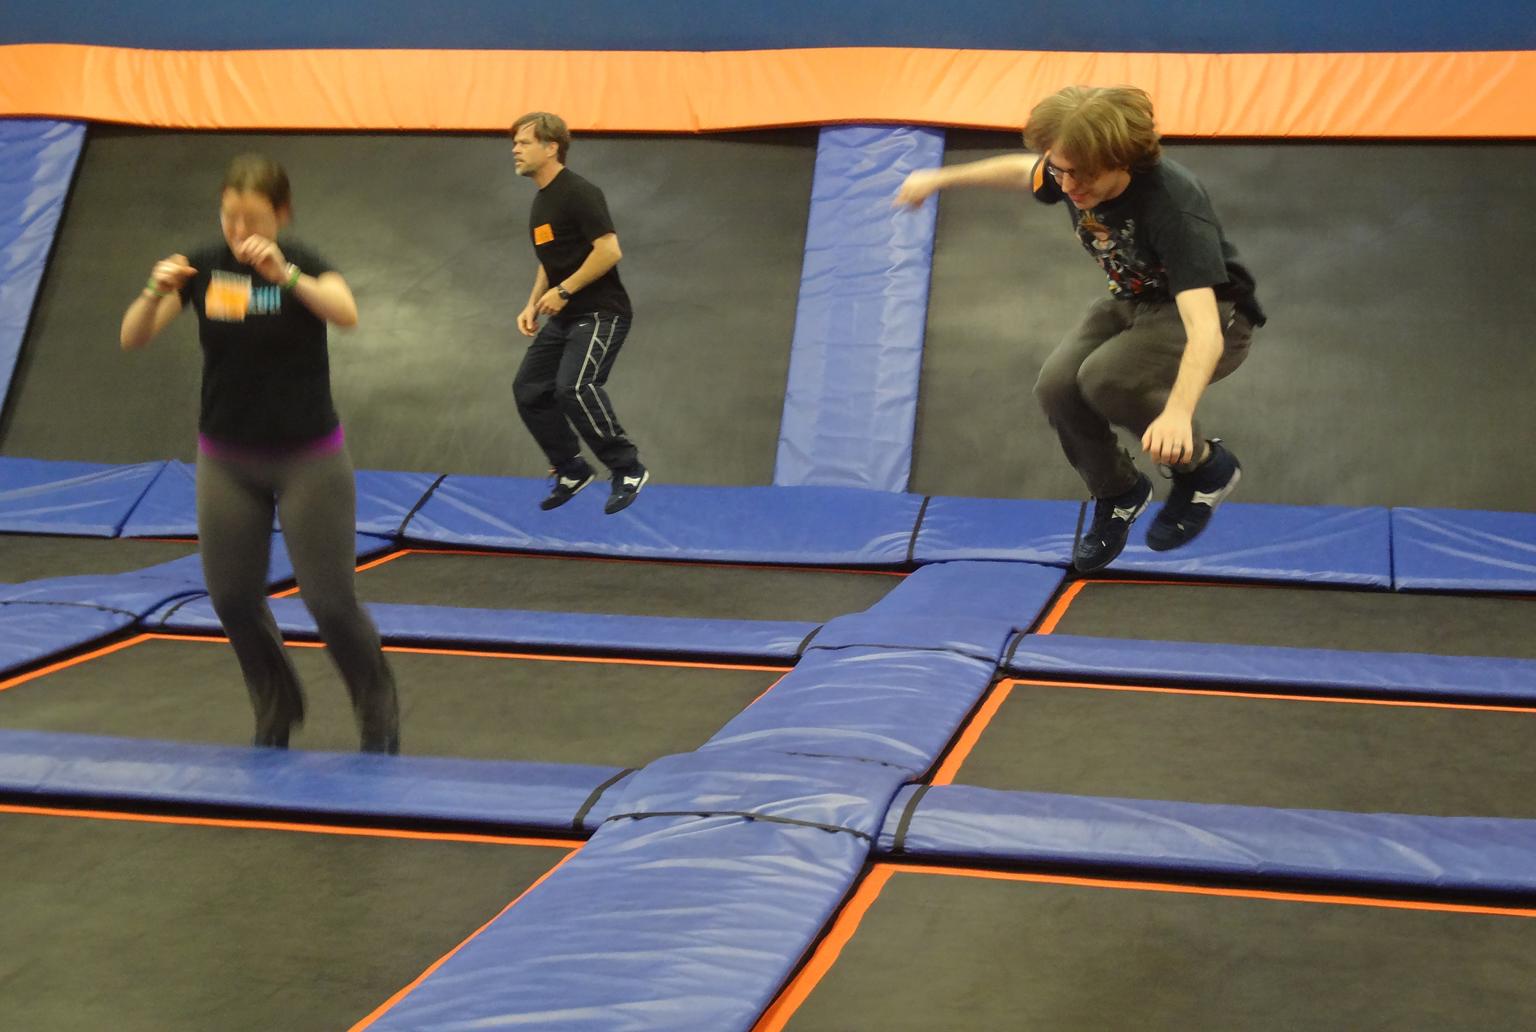 Free jump at Sky Zone